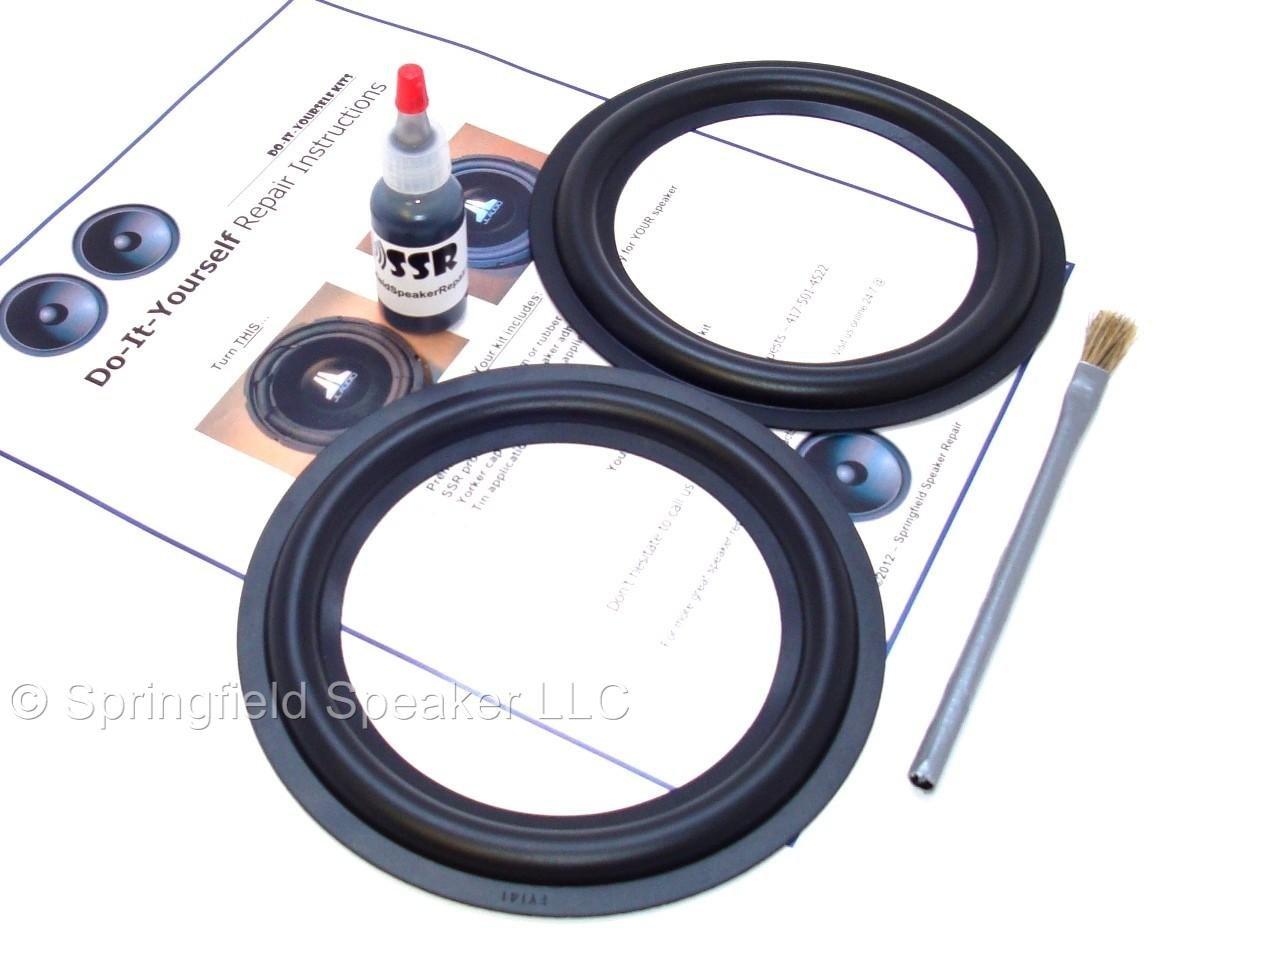 Butyl Rubber 6.5'' Speaker Surround Repair Kit - 2 Piece, 6.5 Inch